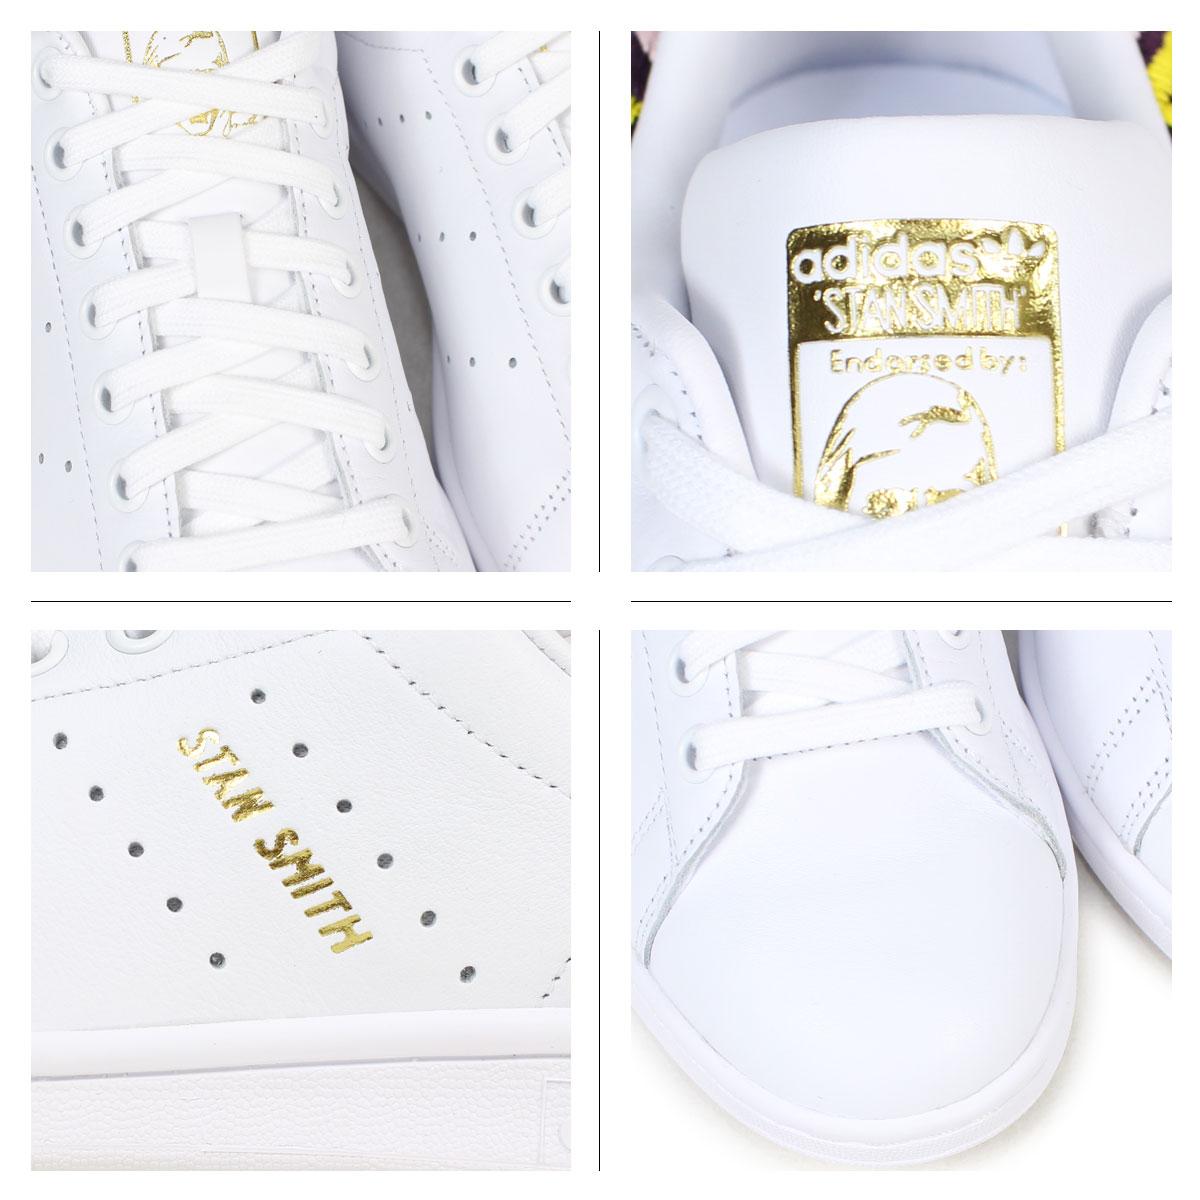 ff5b76202fc7 ALLSPORTS  adidas originals STAN SMITH W Adidas Stan Smith Lady s ...